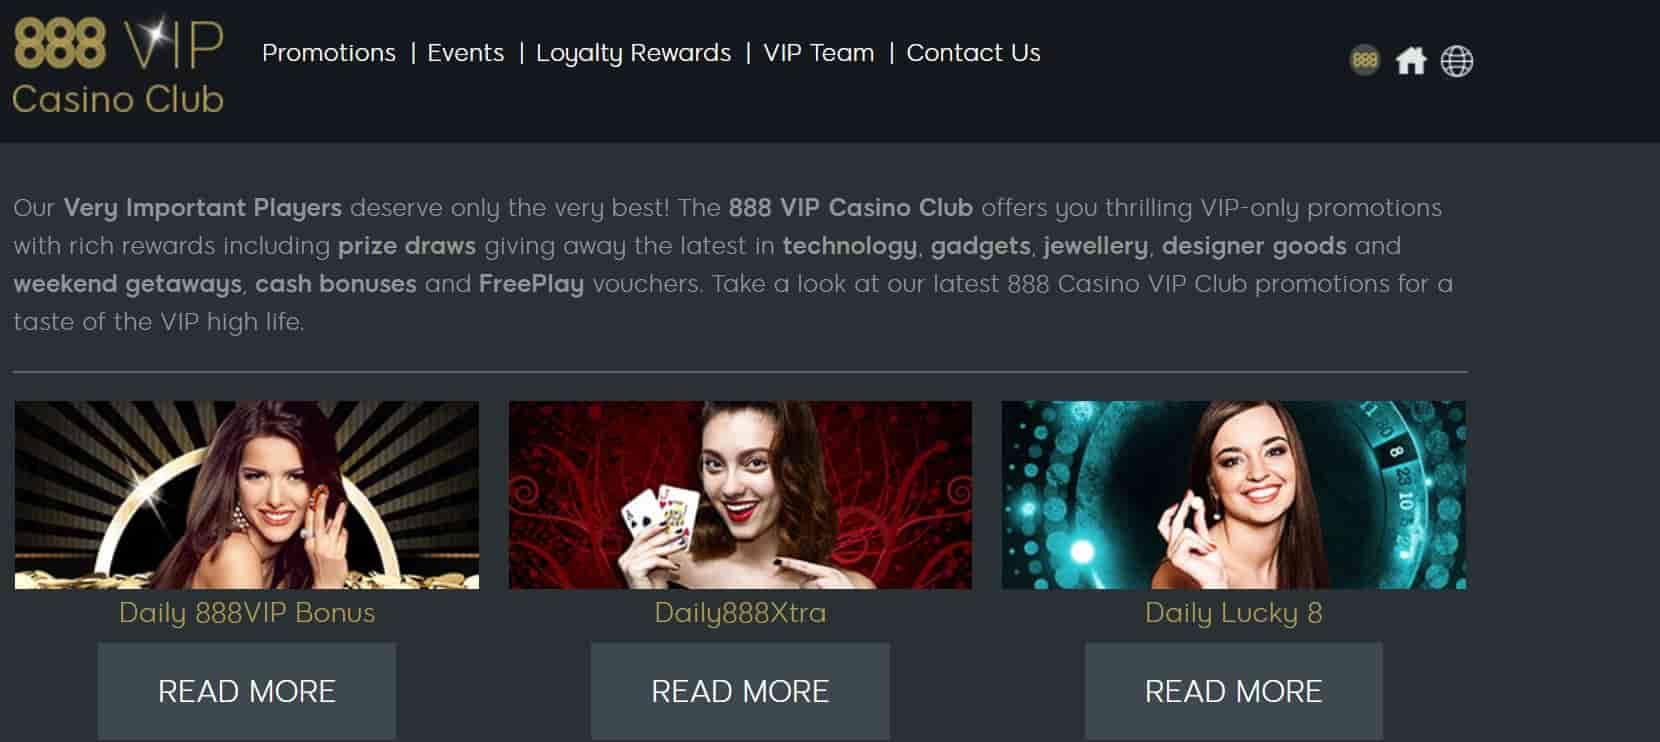 casino 888 vip promotion